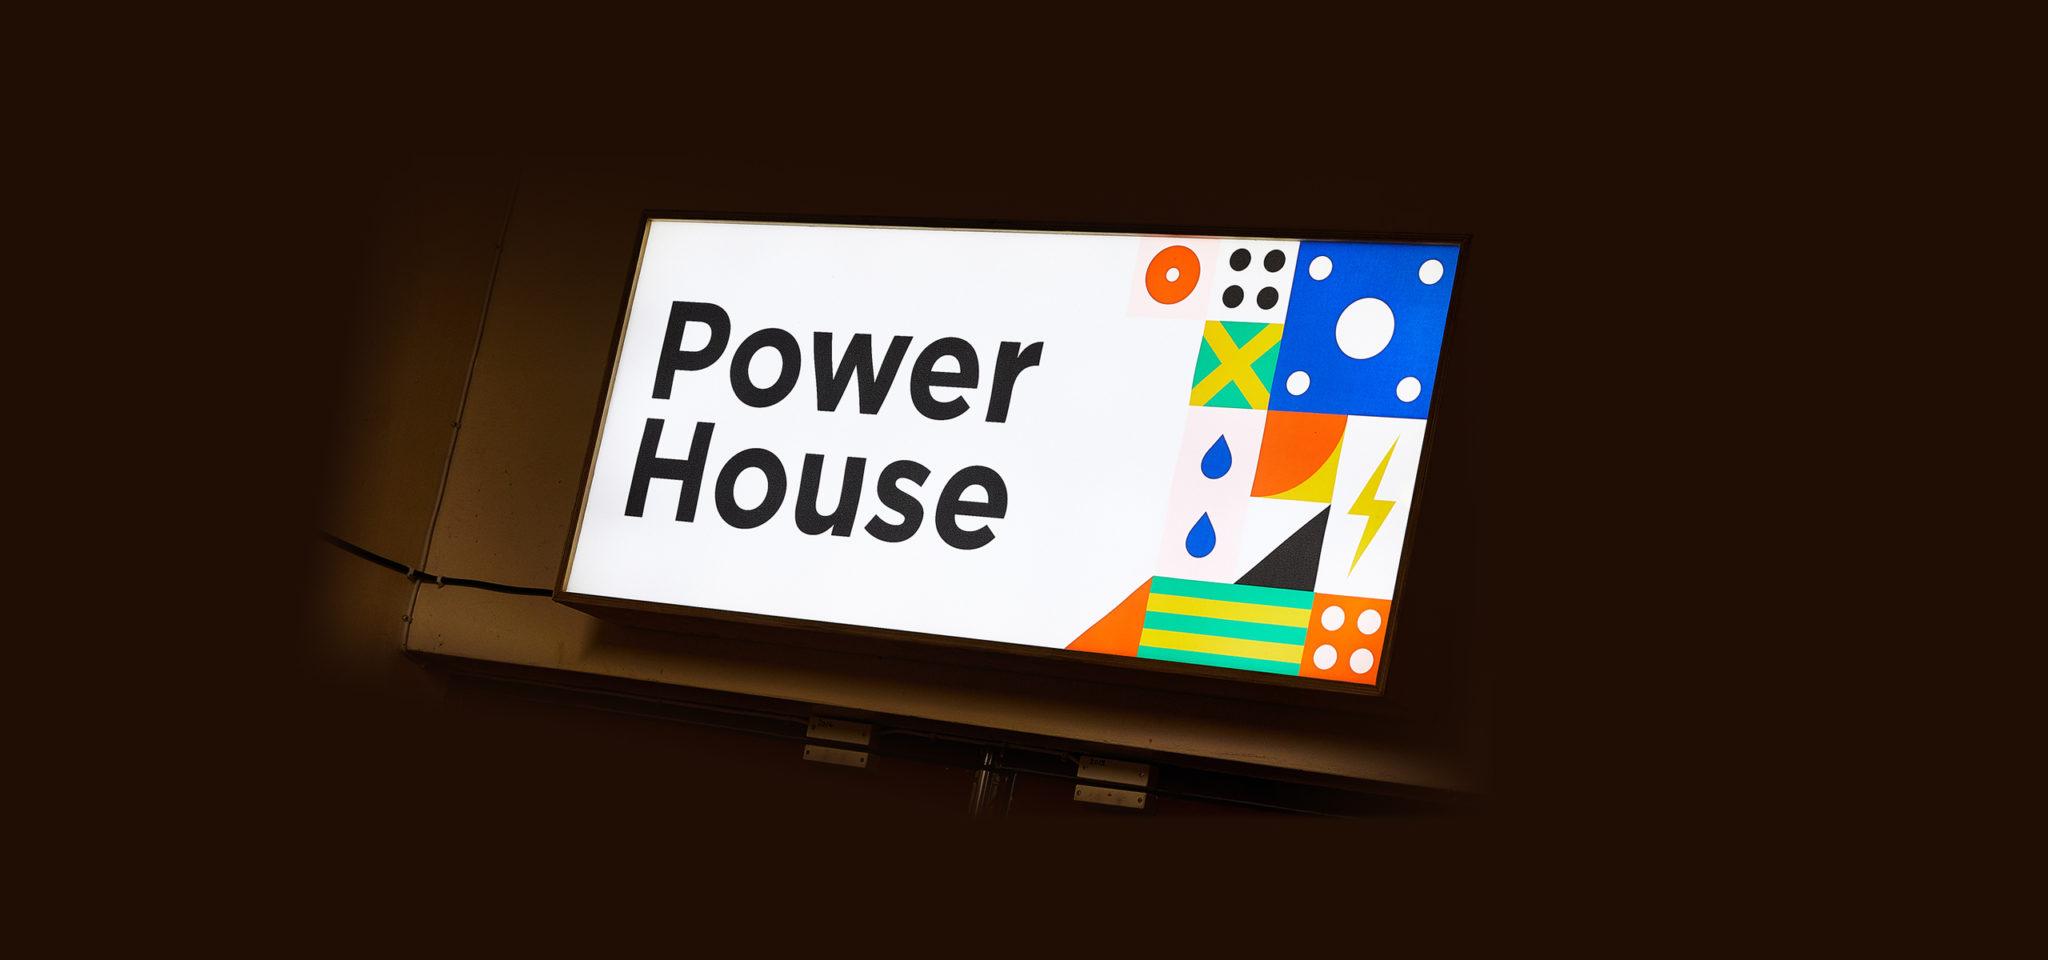 Power House Exhibition Branding, Interior Lightbox Signage